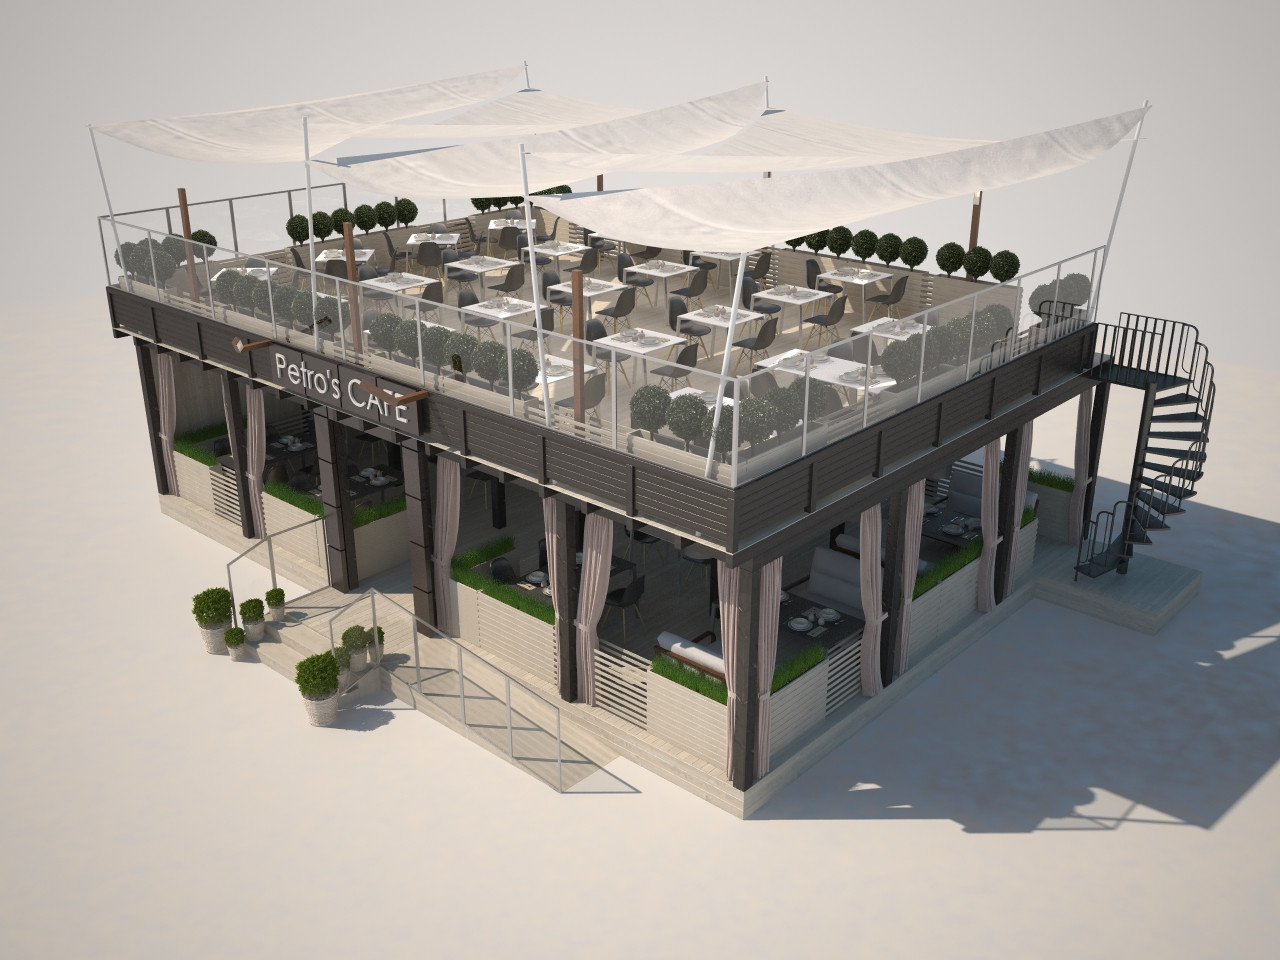 Разработка проекта кафе и его производство. Проекты кафе под ключ.